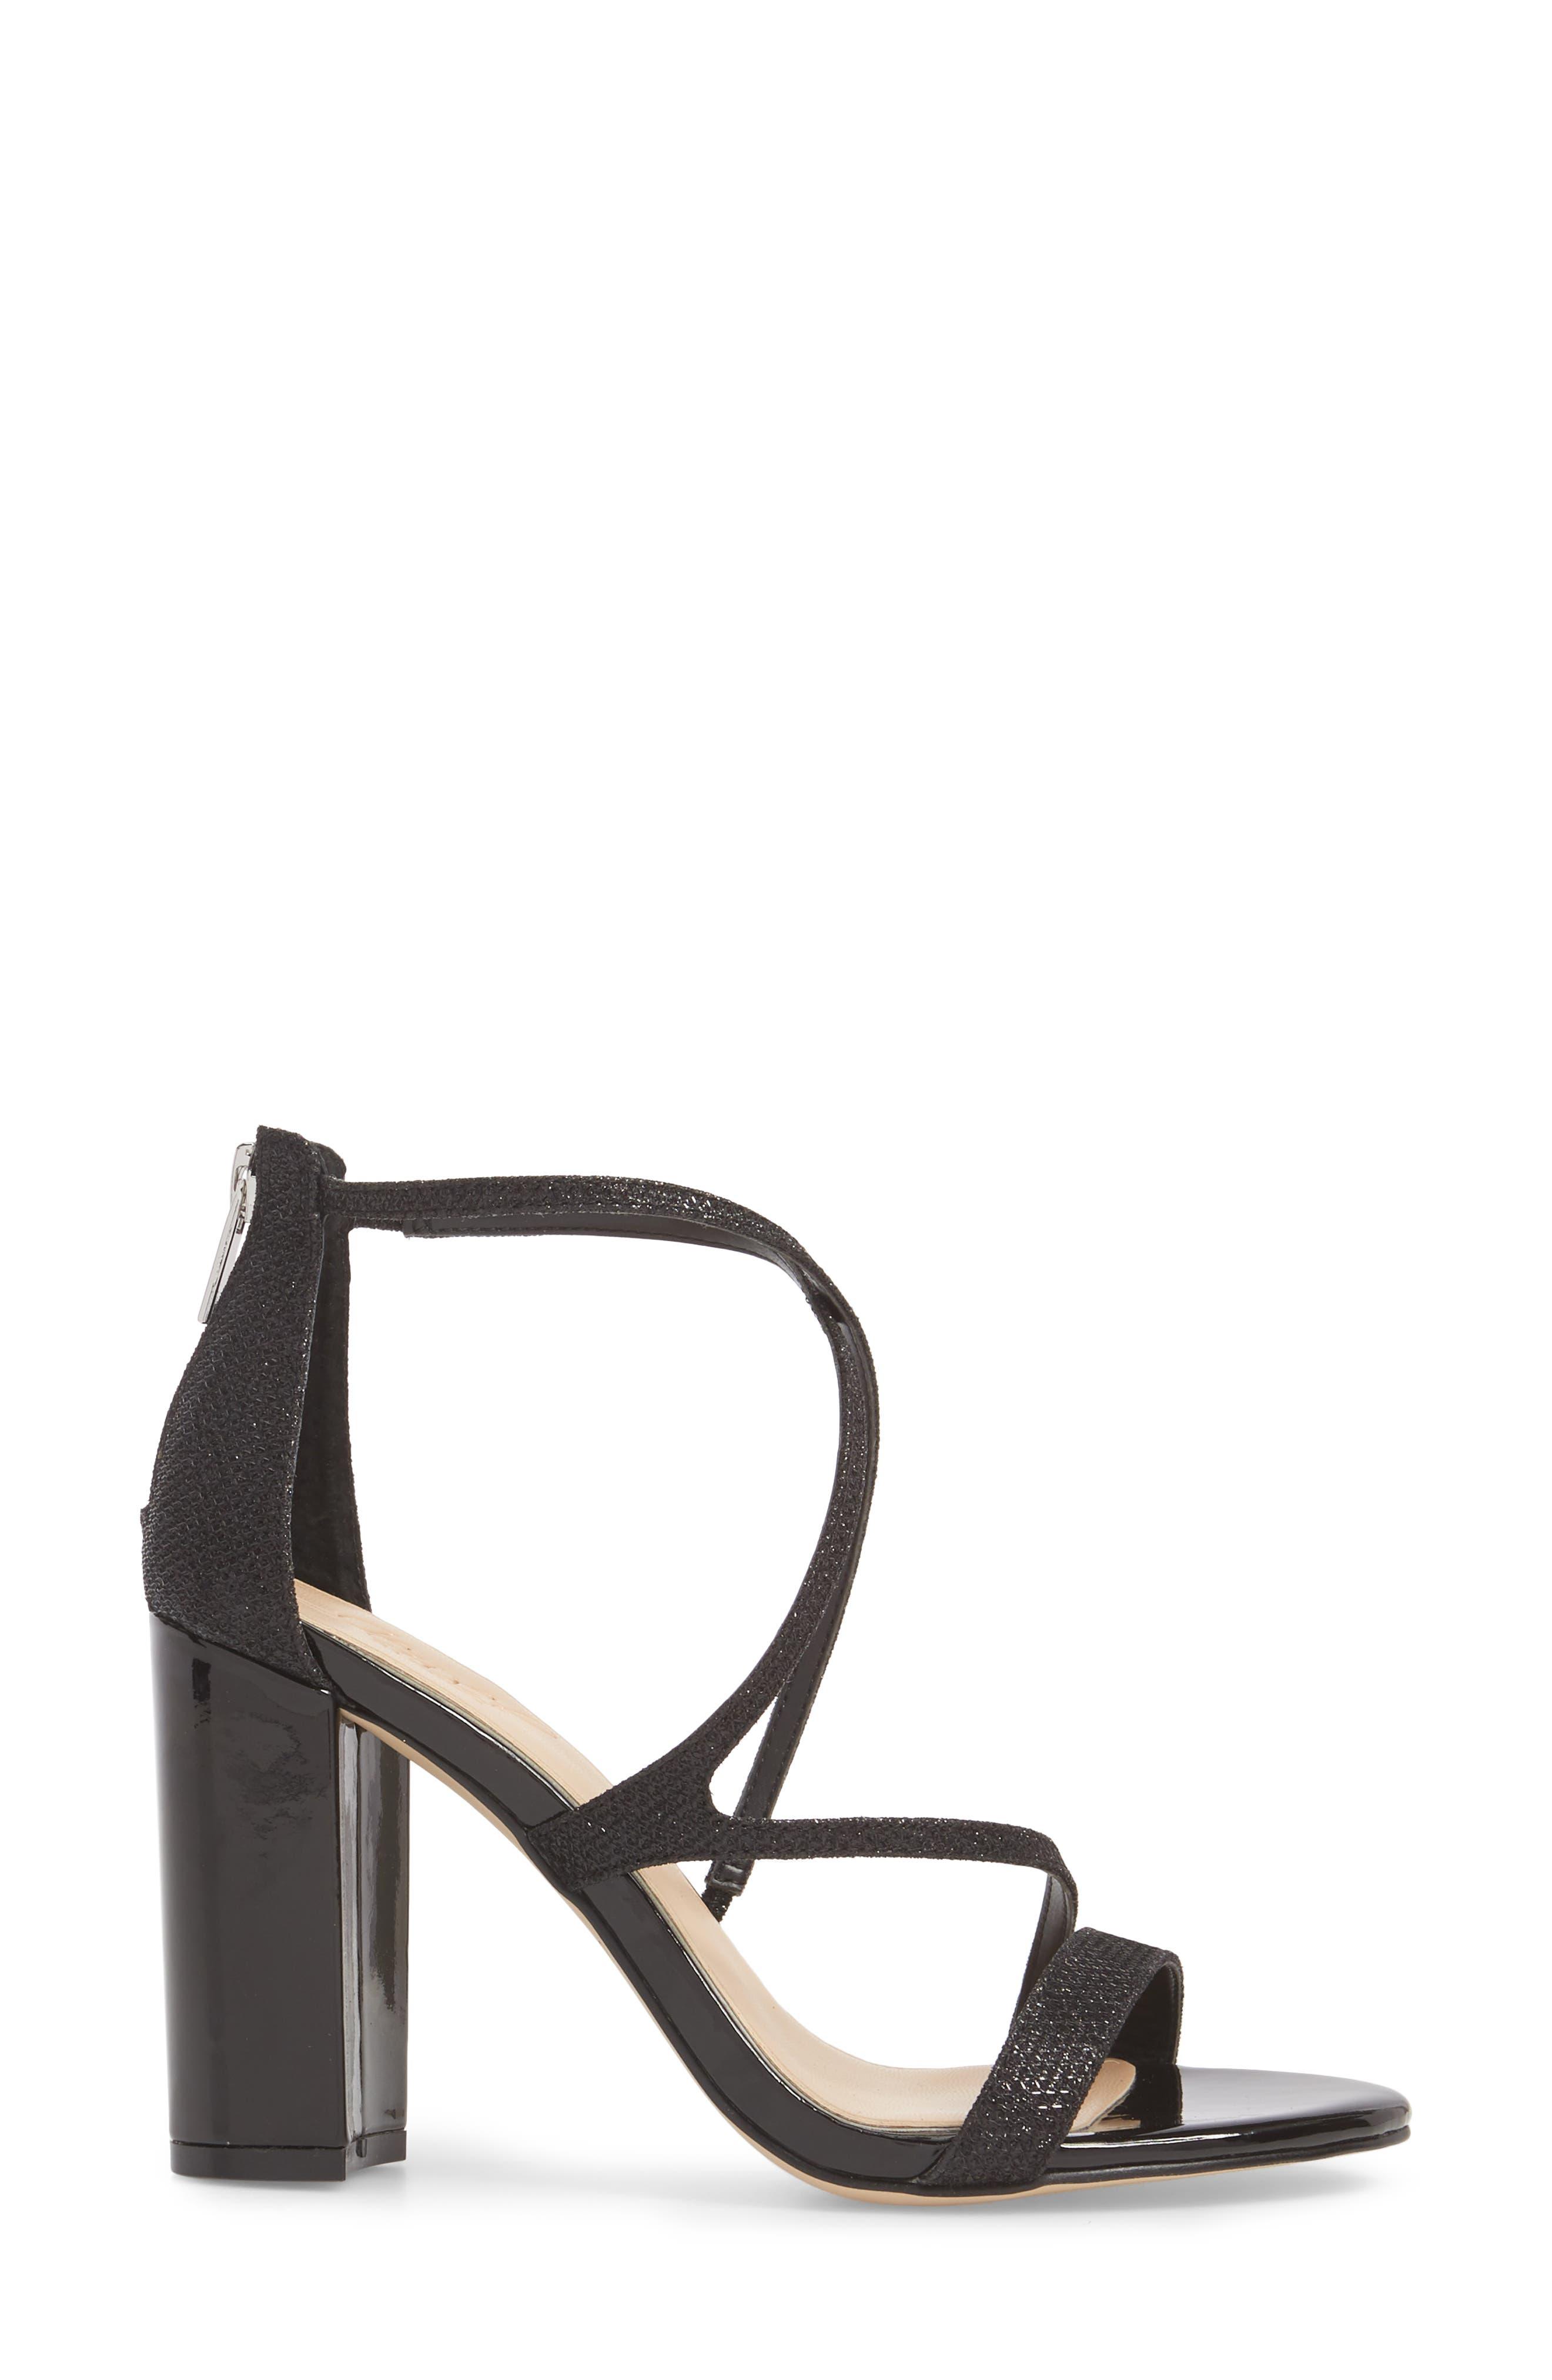 Badgley Mischka Gale Block Heel Sandal,                             Alternate thumbnail 3, color,                             BLACK GLITTER FABRIC